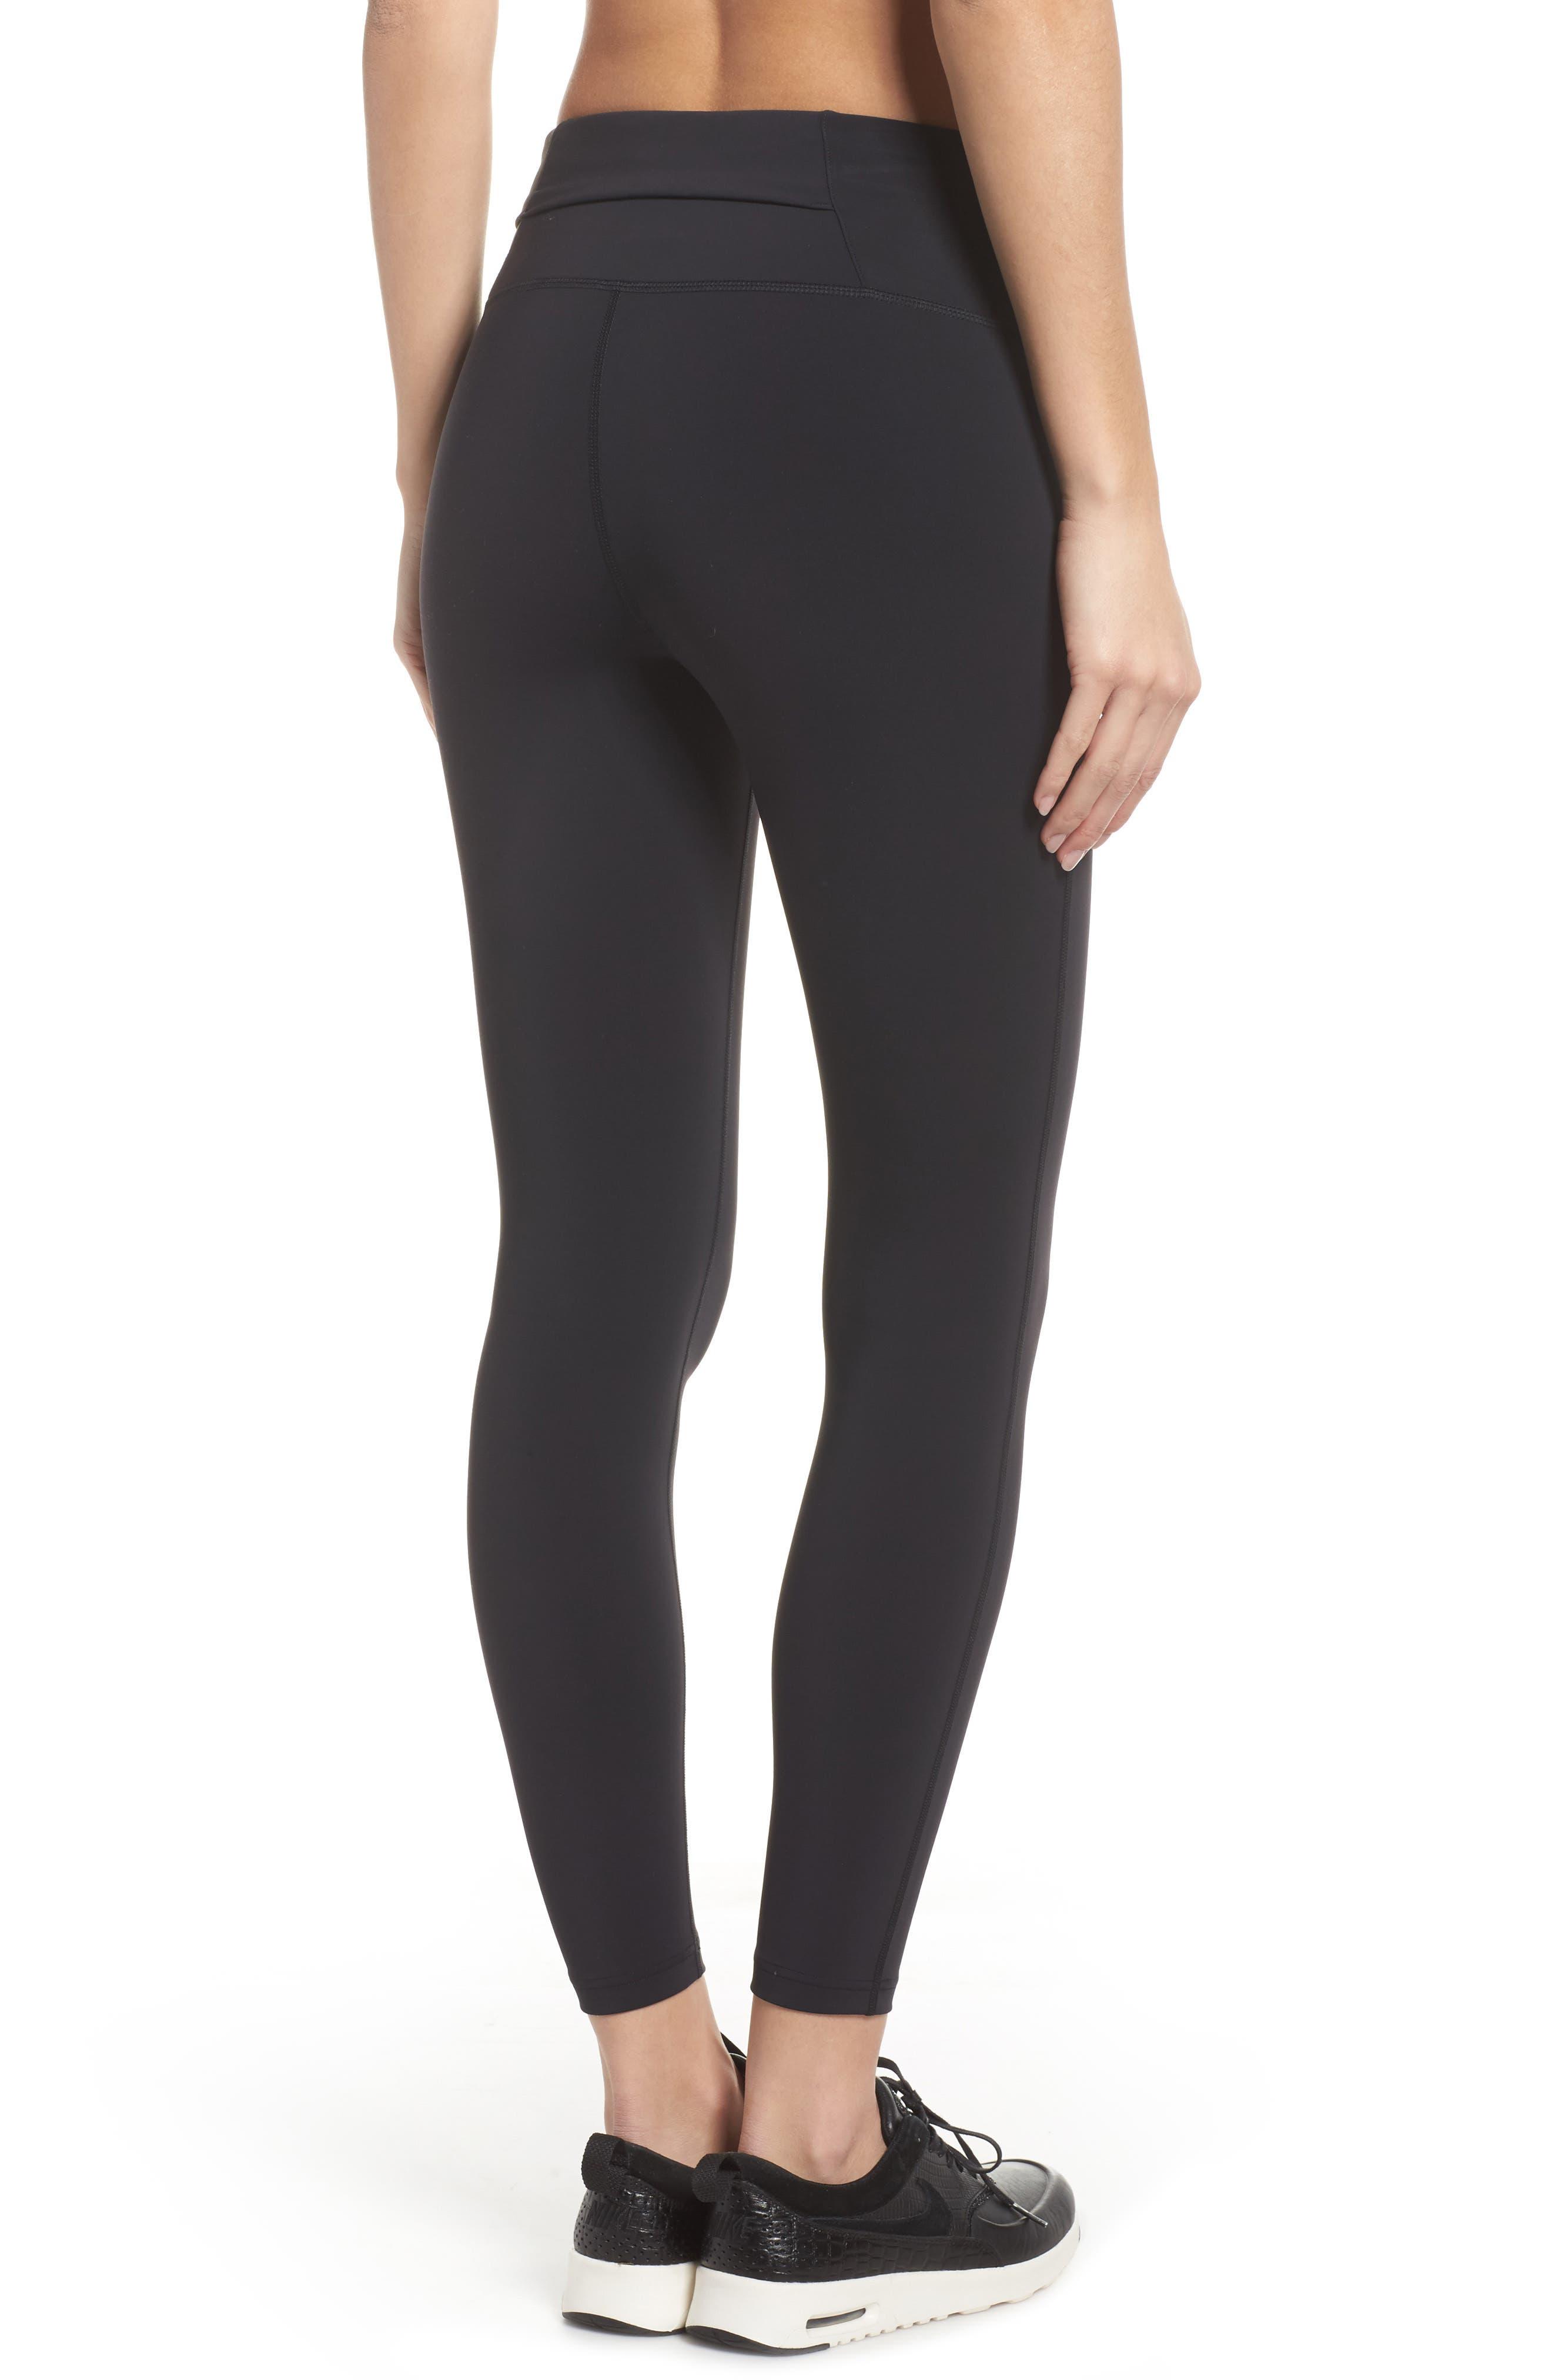 NikeLab Women's Tights,                             Alternate thumbnail 2, color,                             BLACK/ BLACK